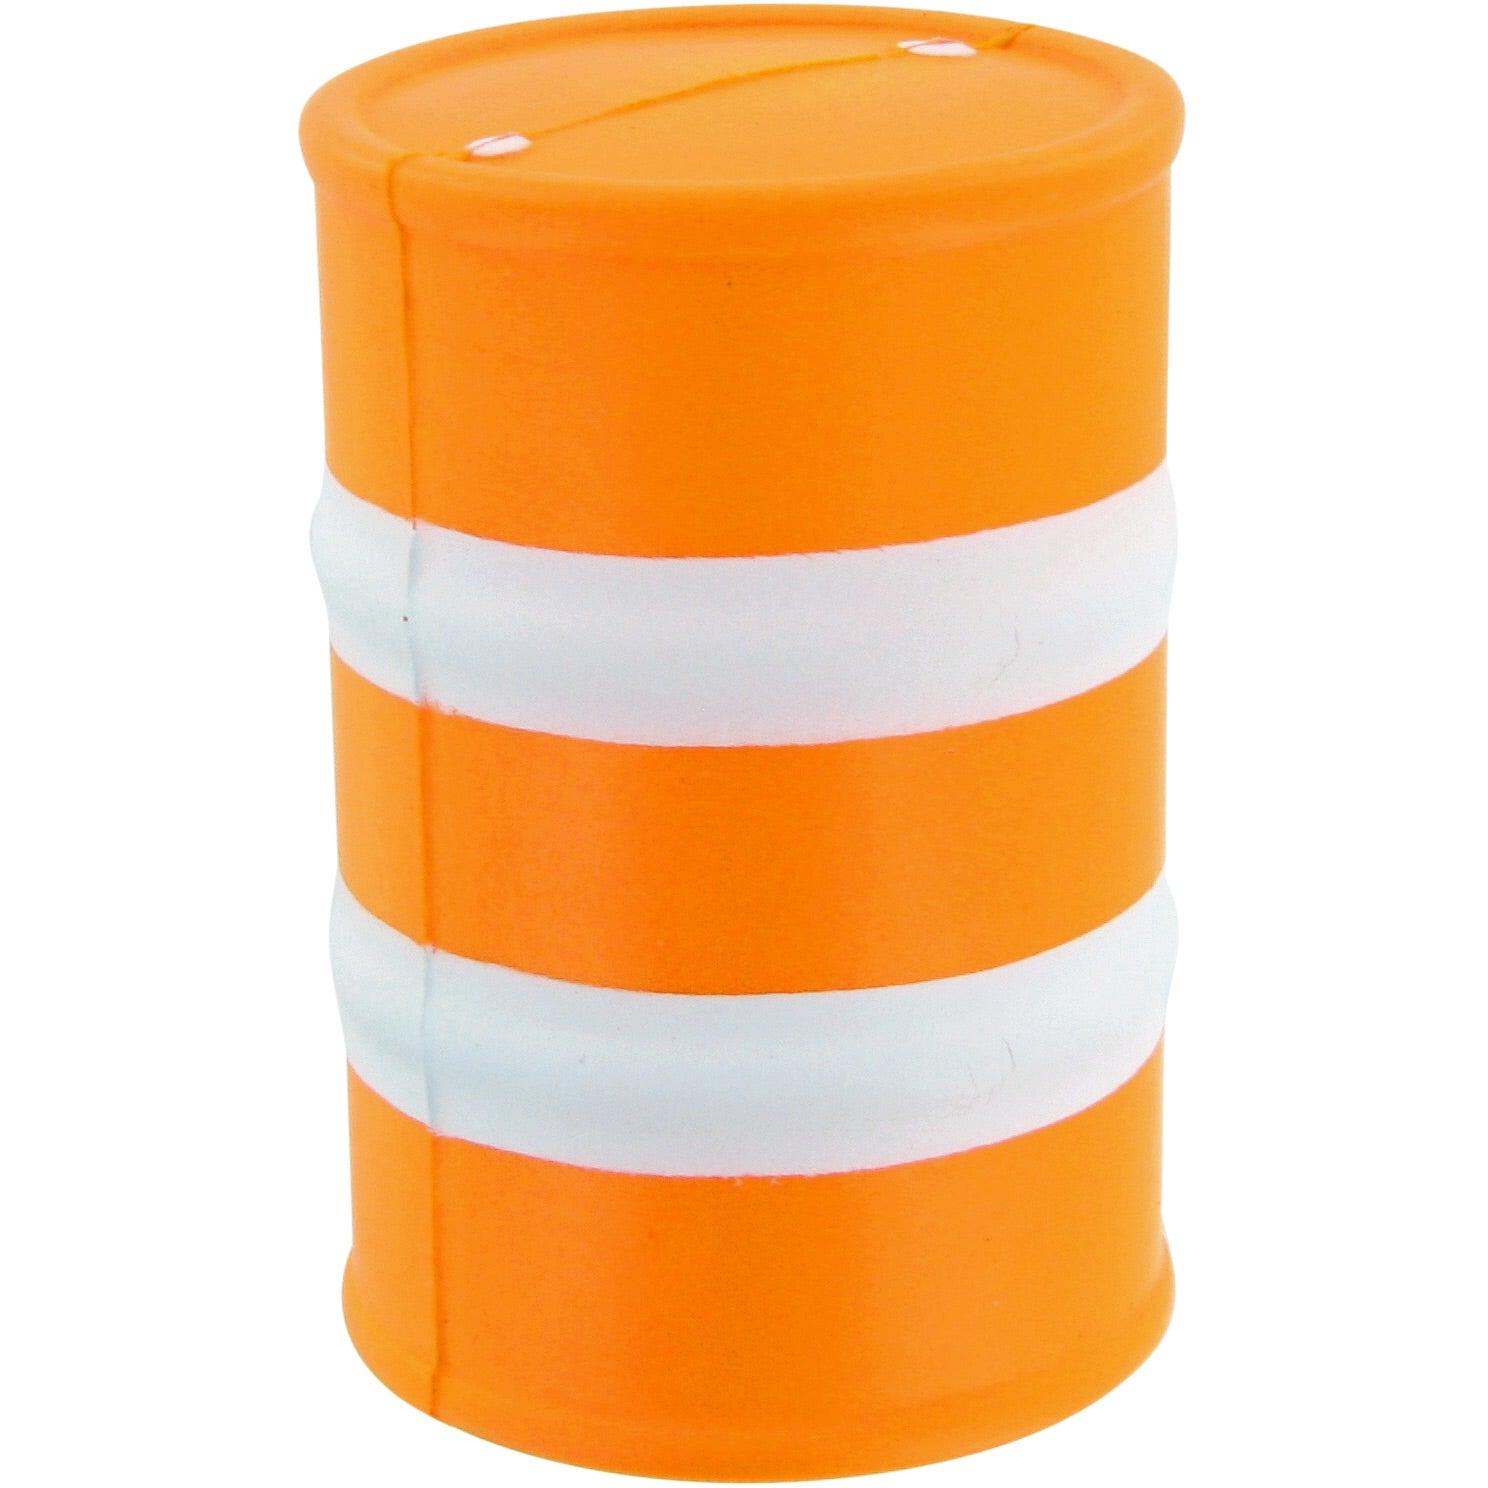 Safety Barrel Stress Toy